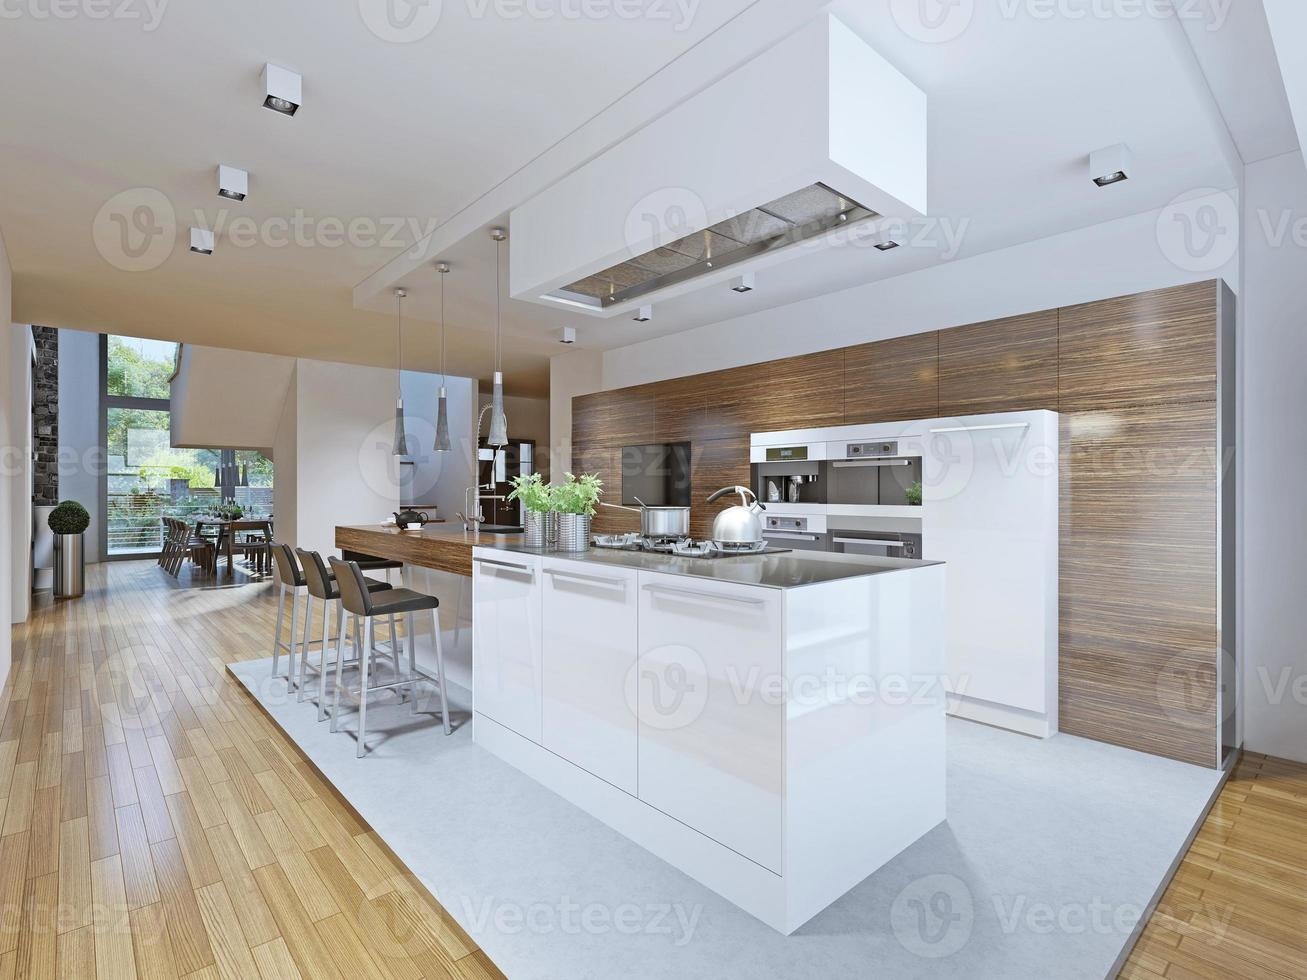 lichte keuken in avant-gardistische stijl foto